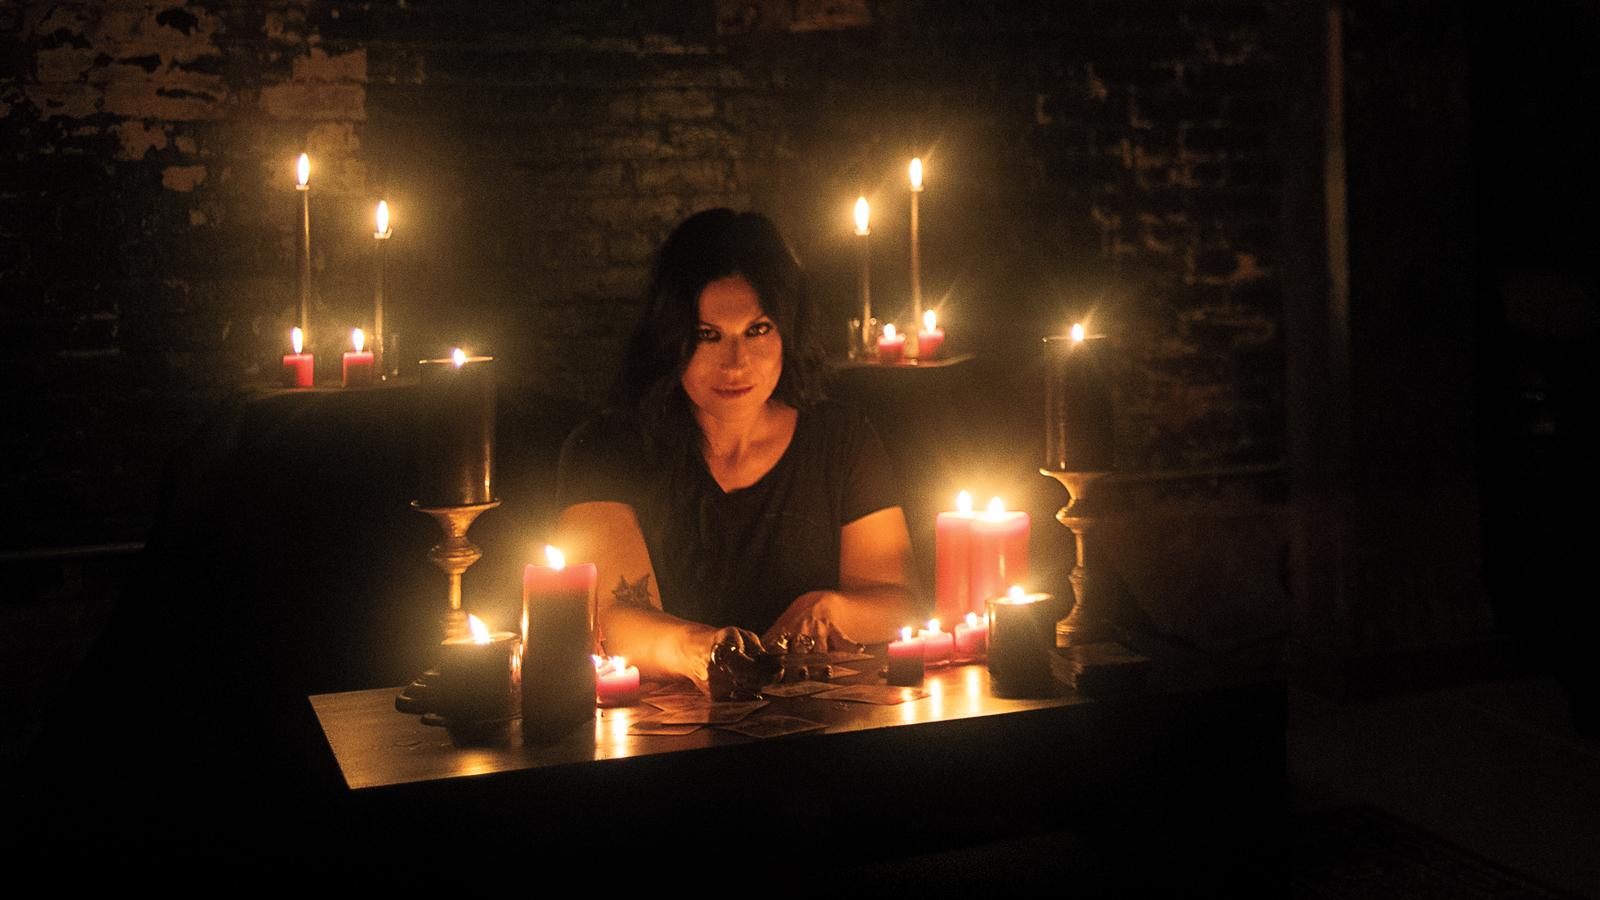 Lacuna Coil's Cristina Scabbia Gets Tarot Reading, Talks Parents' Death, Band's Future